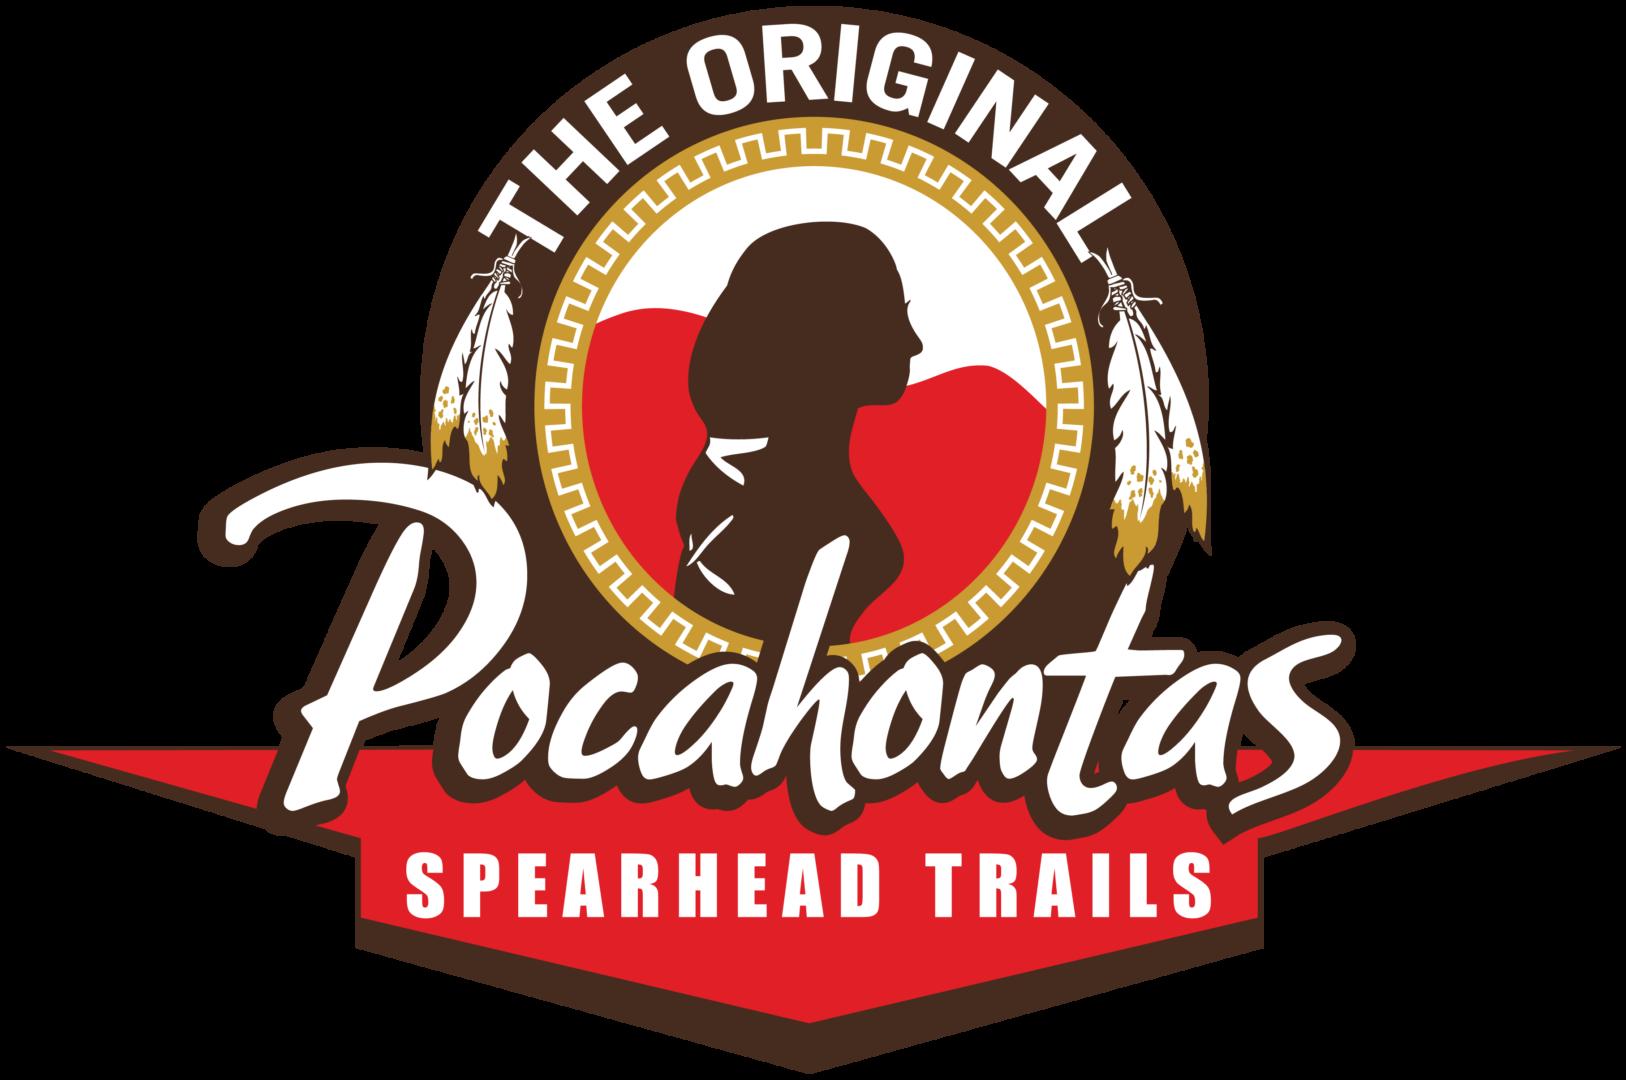 https://spearheadtrails.com/wp-content/uploads/2020/07/pocahontas.png